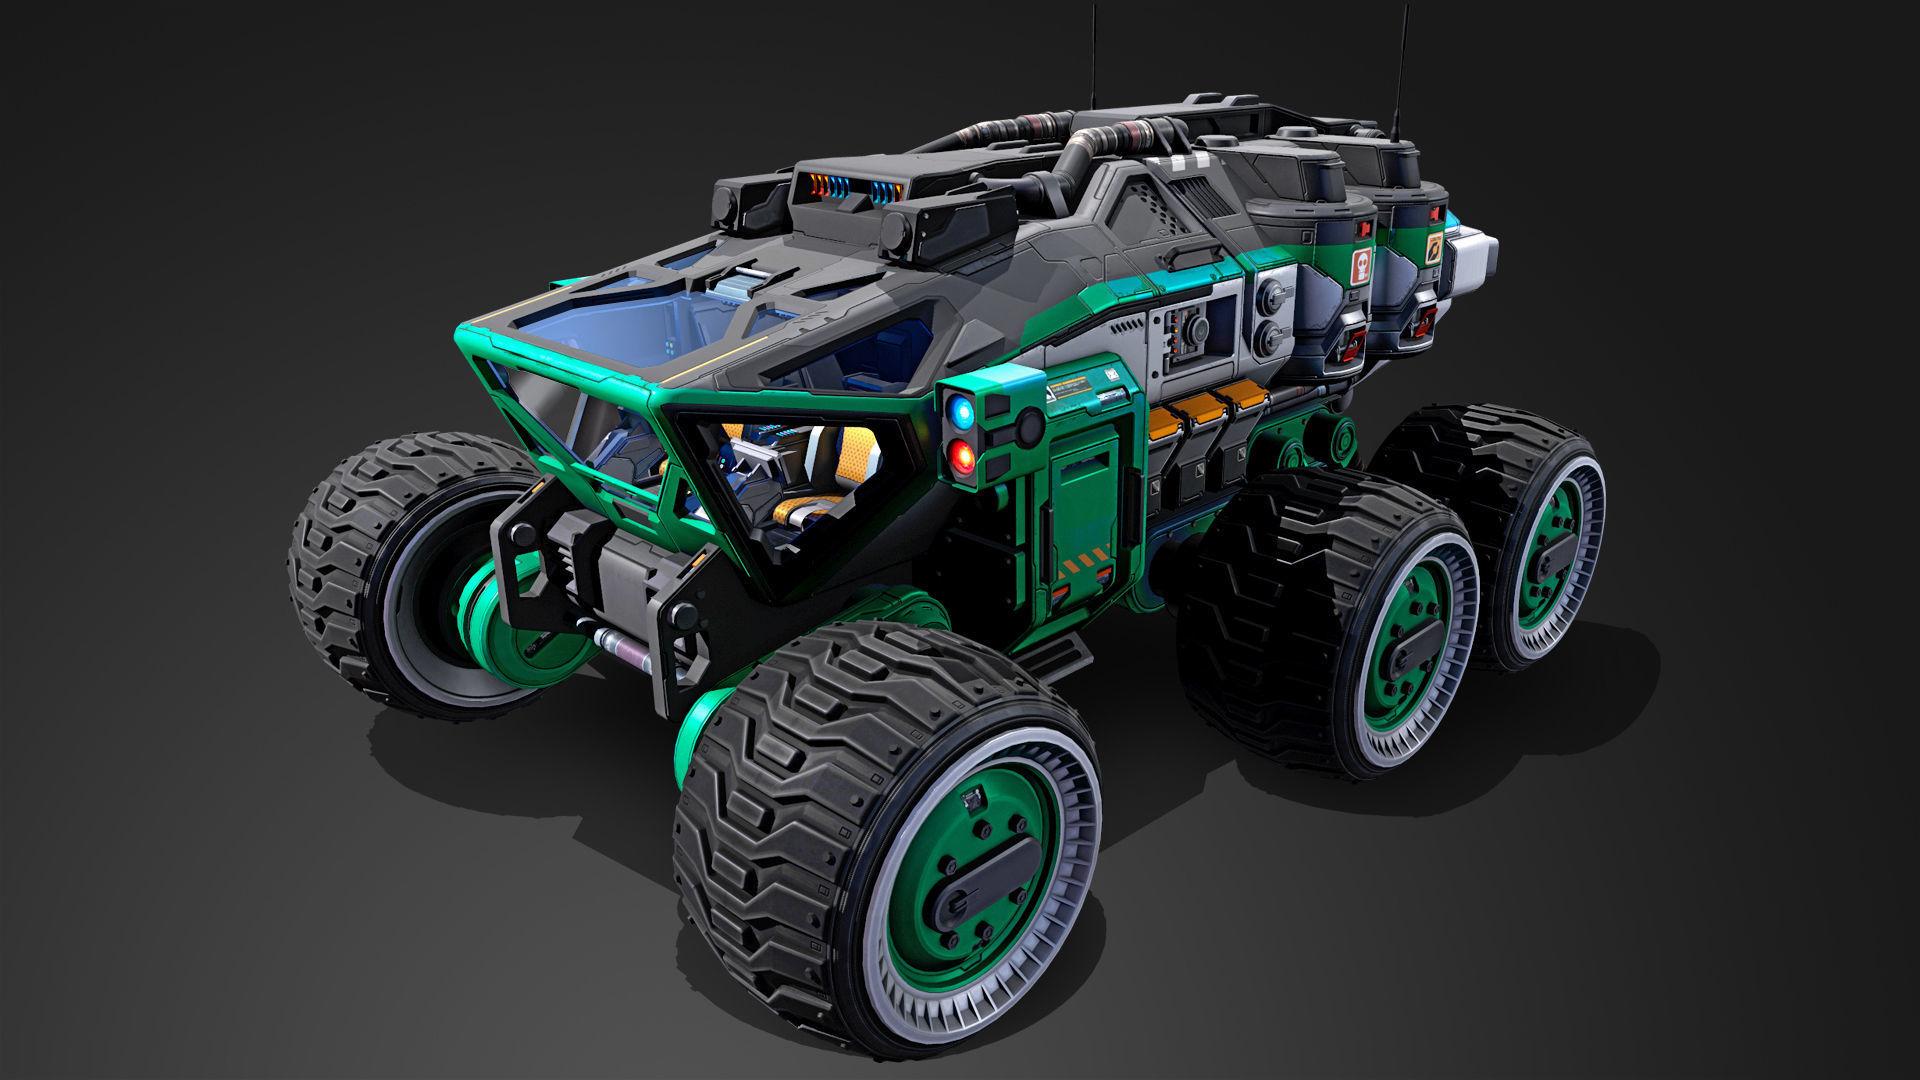 Mars Rover vehicle